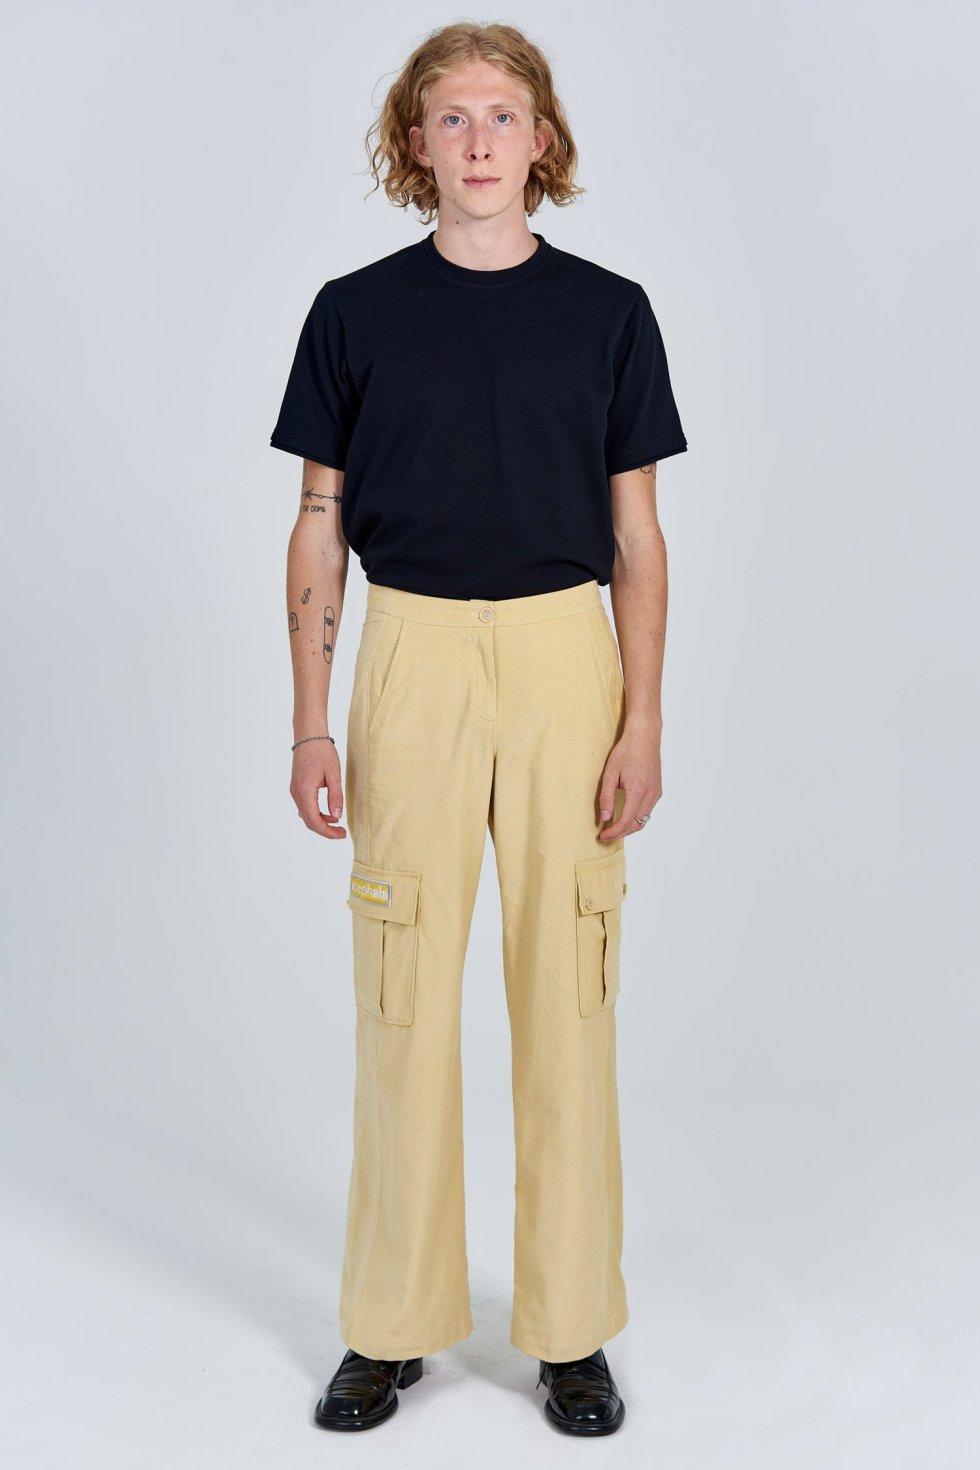 Acephala Fw 2020 21 Black Unisex T Shirt Yellow Corduroy Trousers Male Front